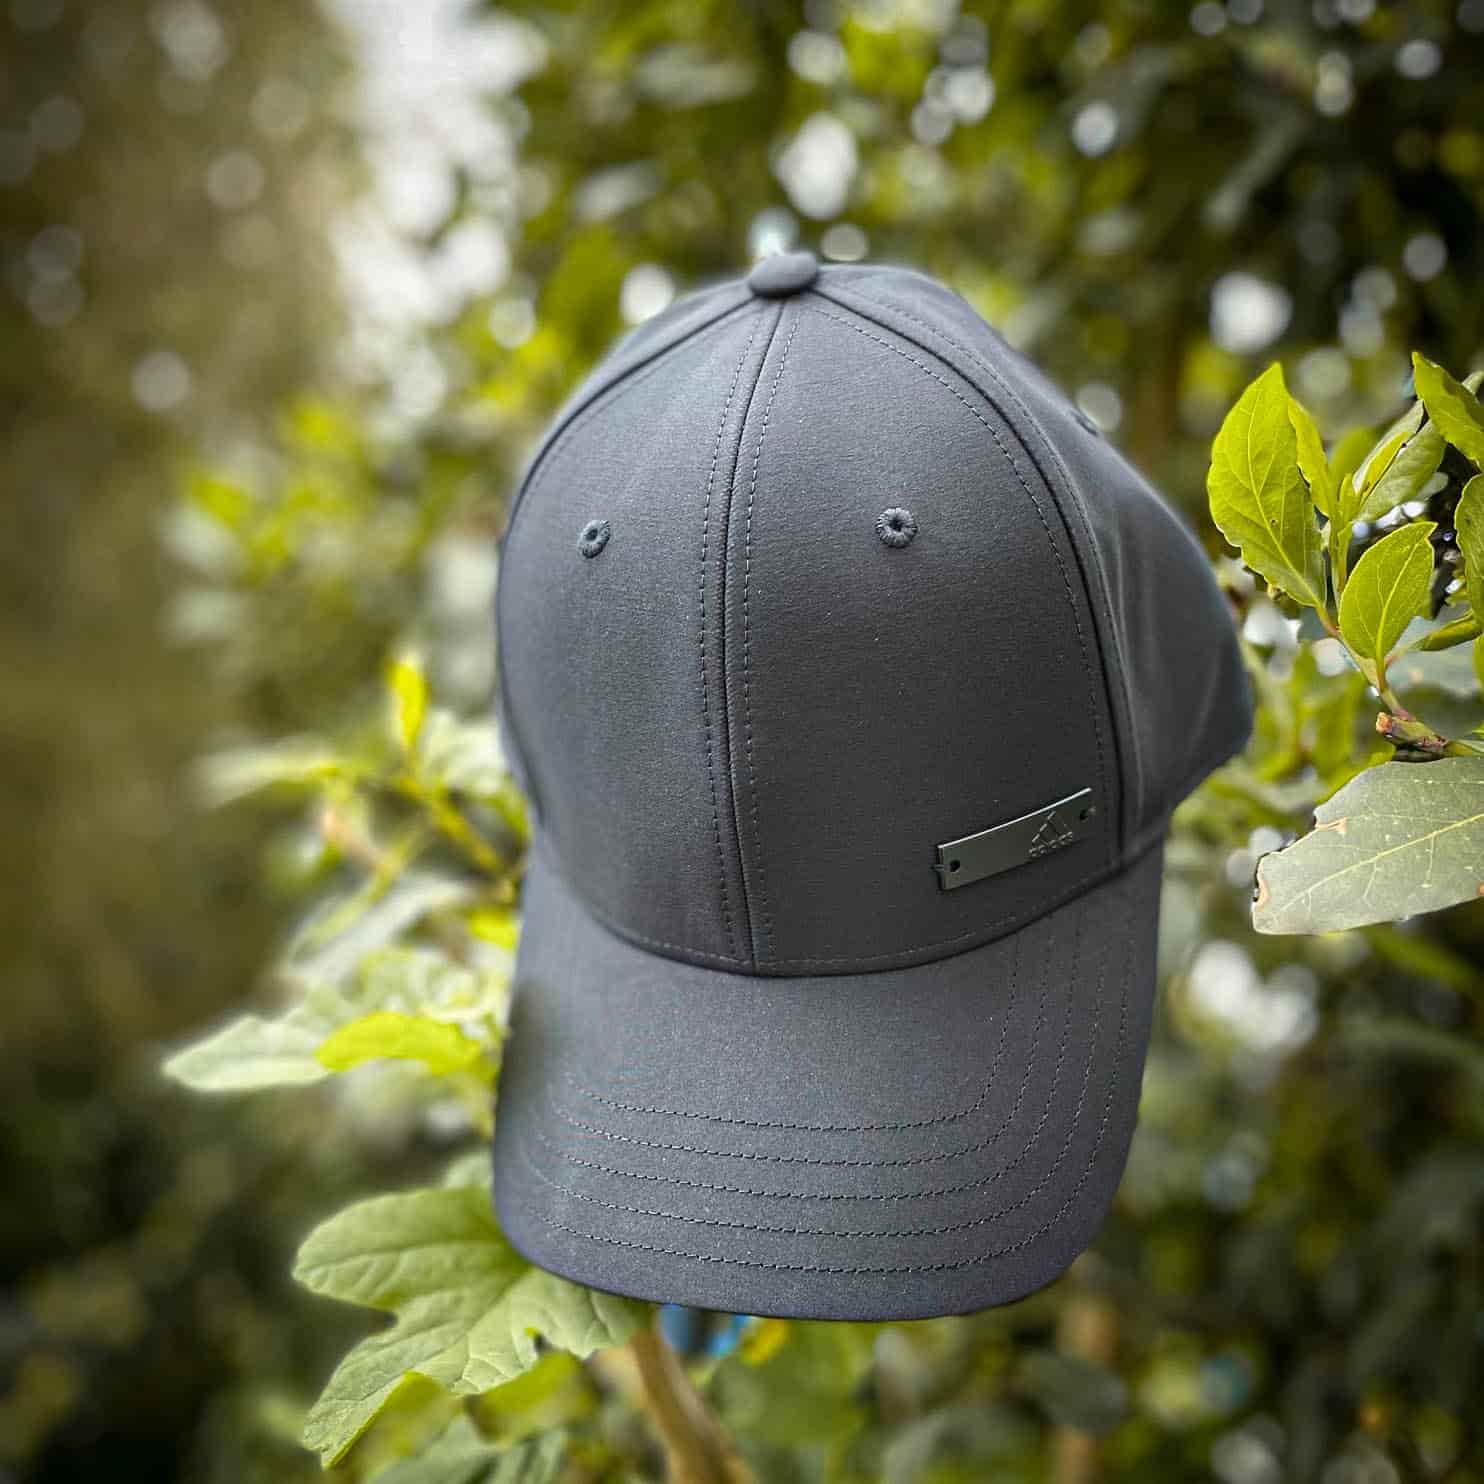 gorra adidas metalbadge negra